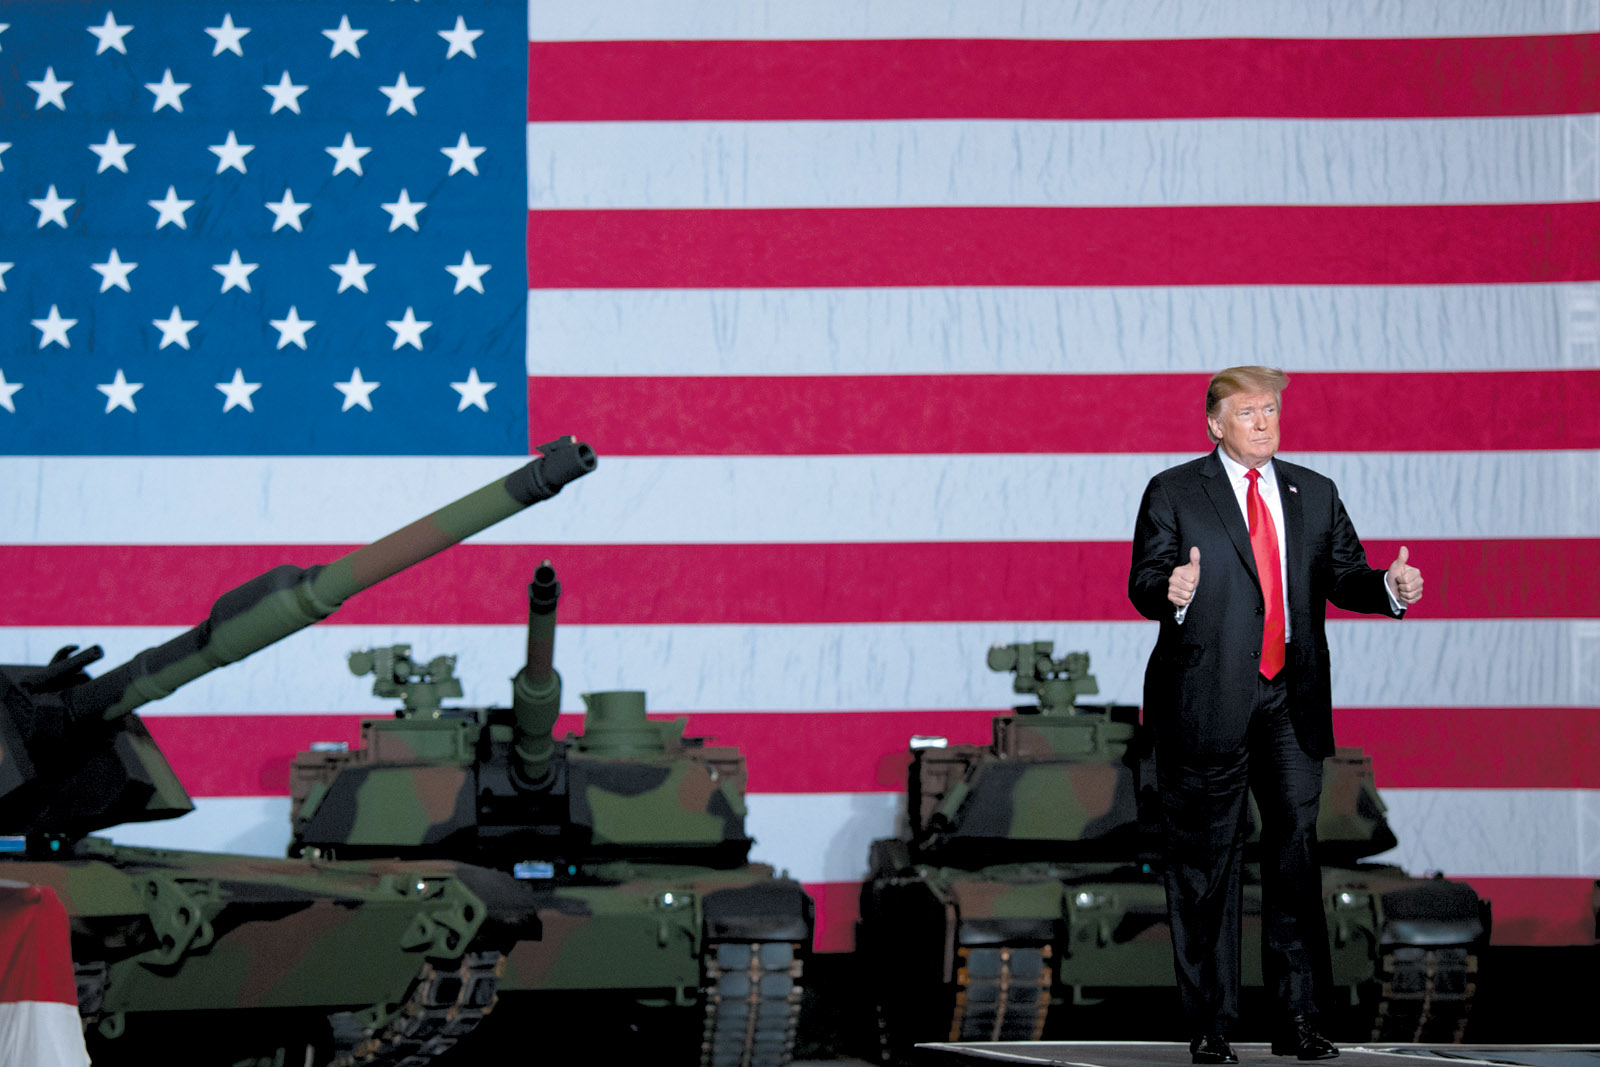 President Trump, Lima, Ohio, 2019